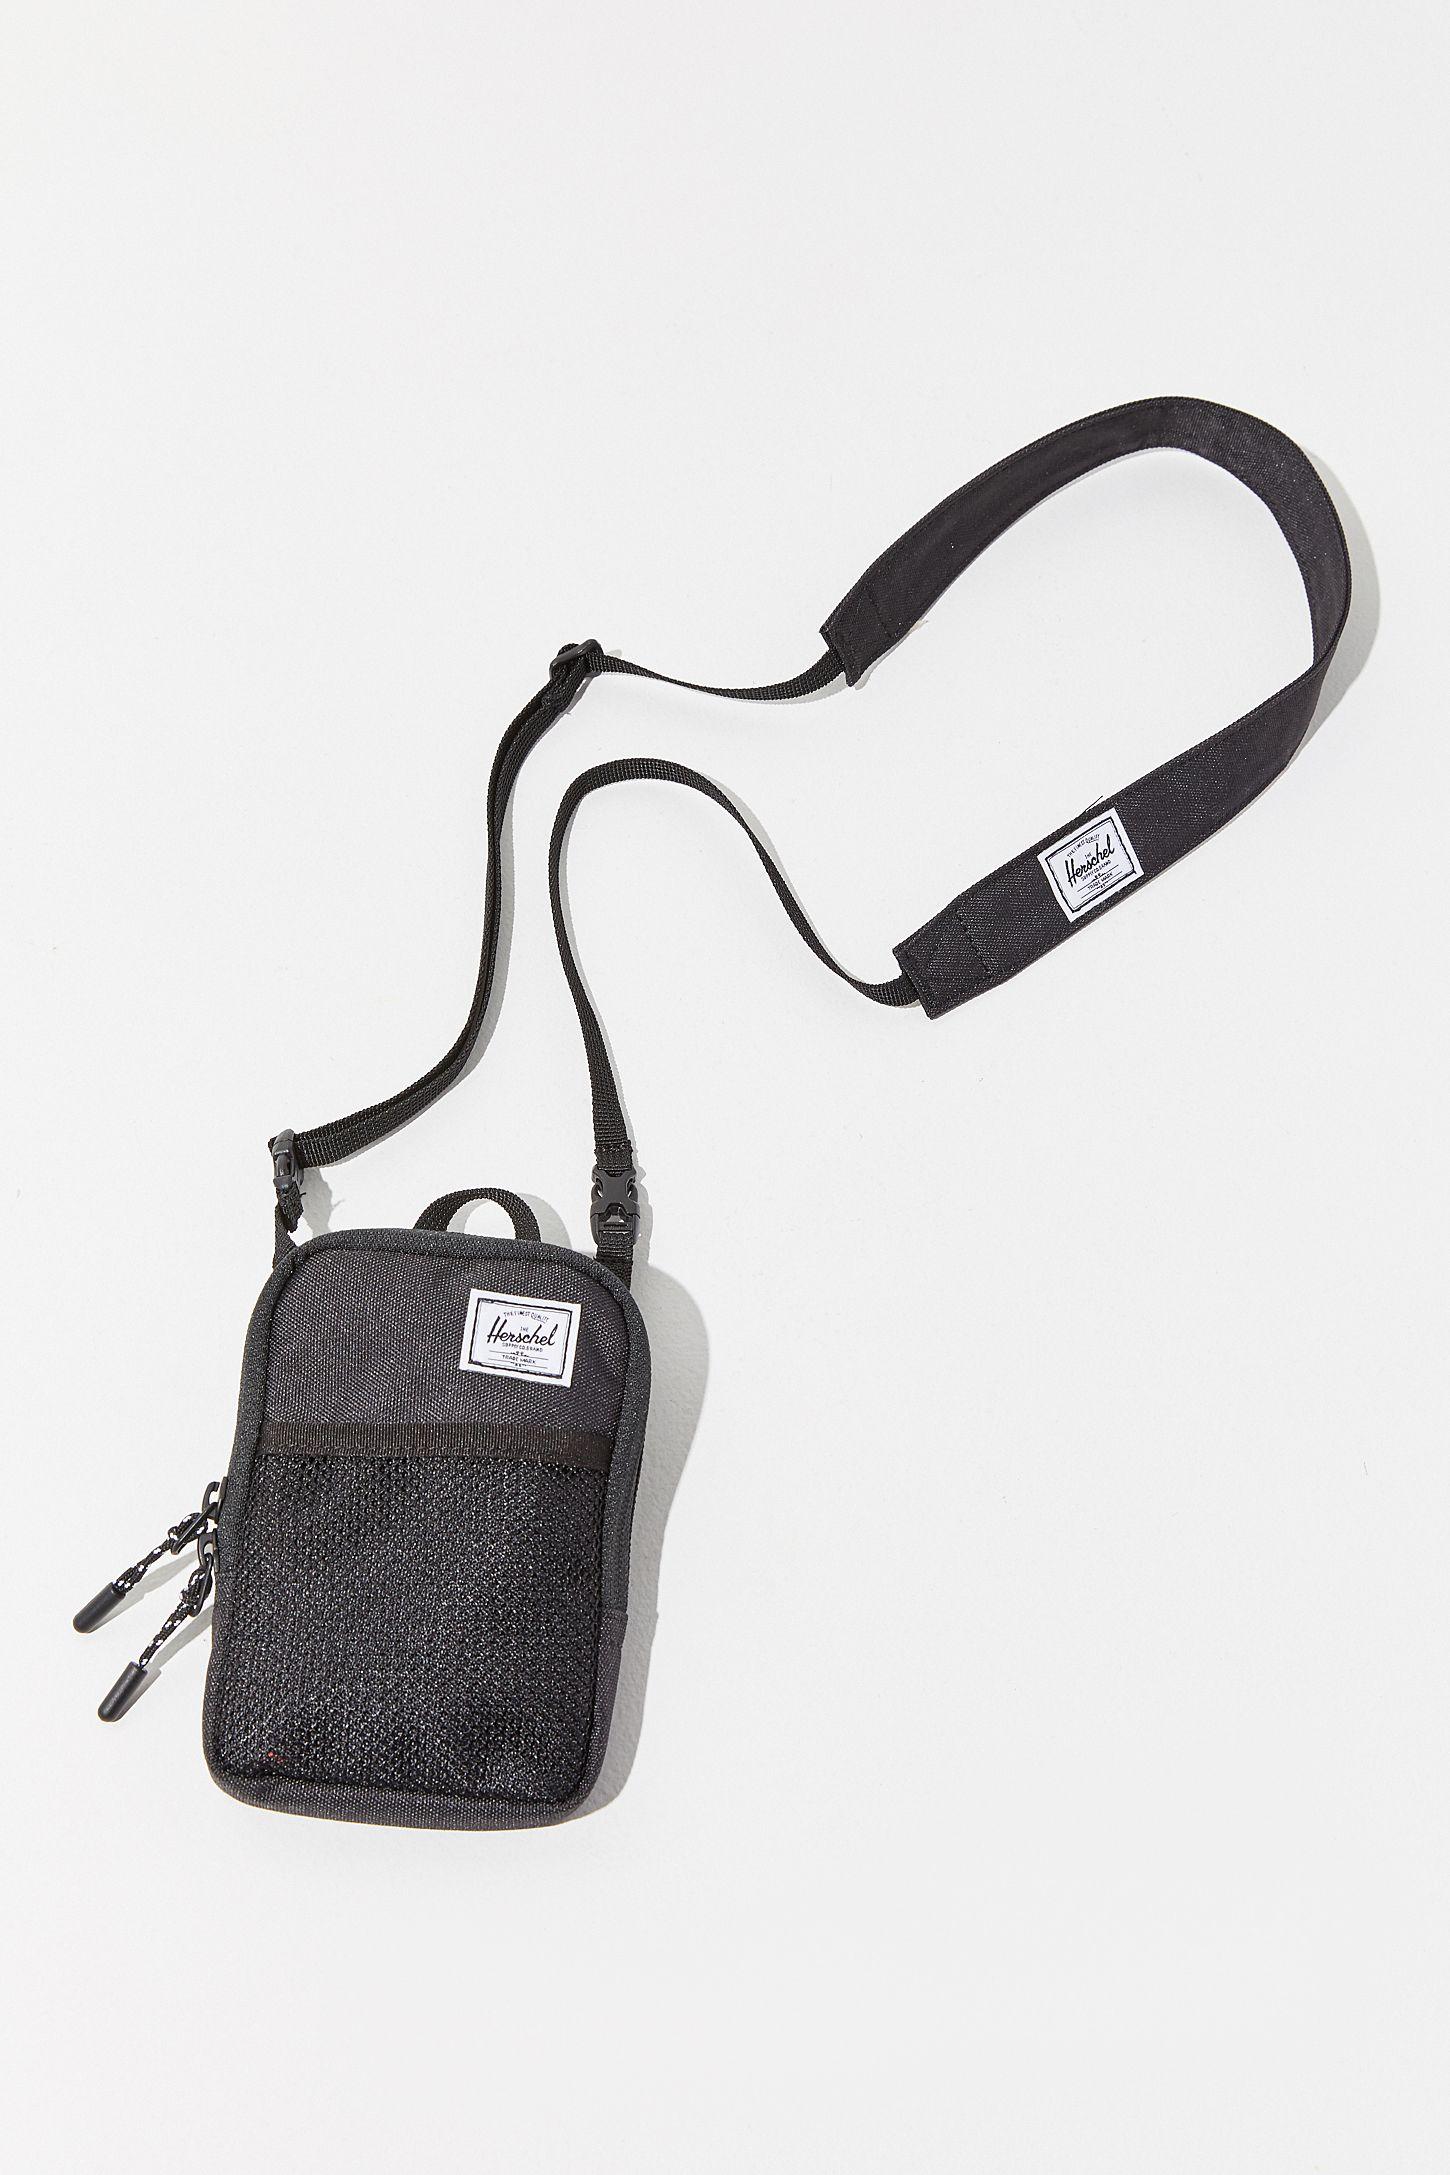 7f02b607ffb Slide View  5  Herschel Supply Co. Sinclair Small Crossbody Bag